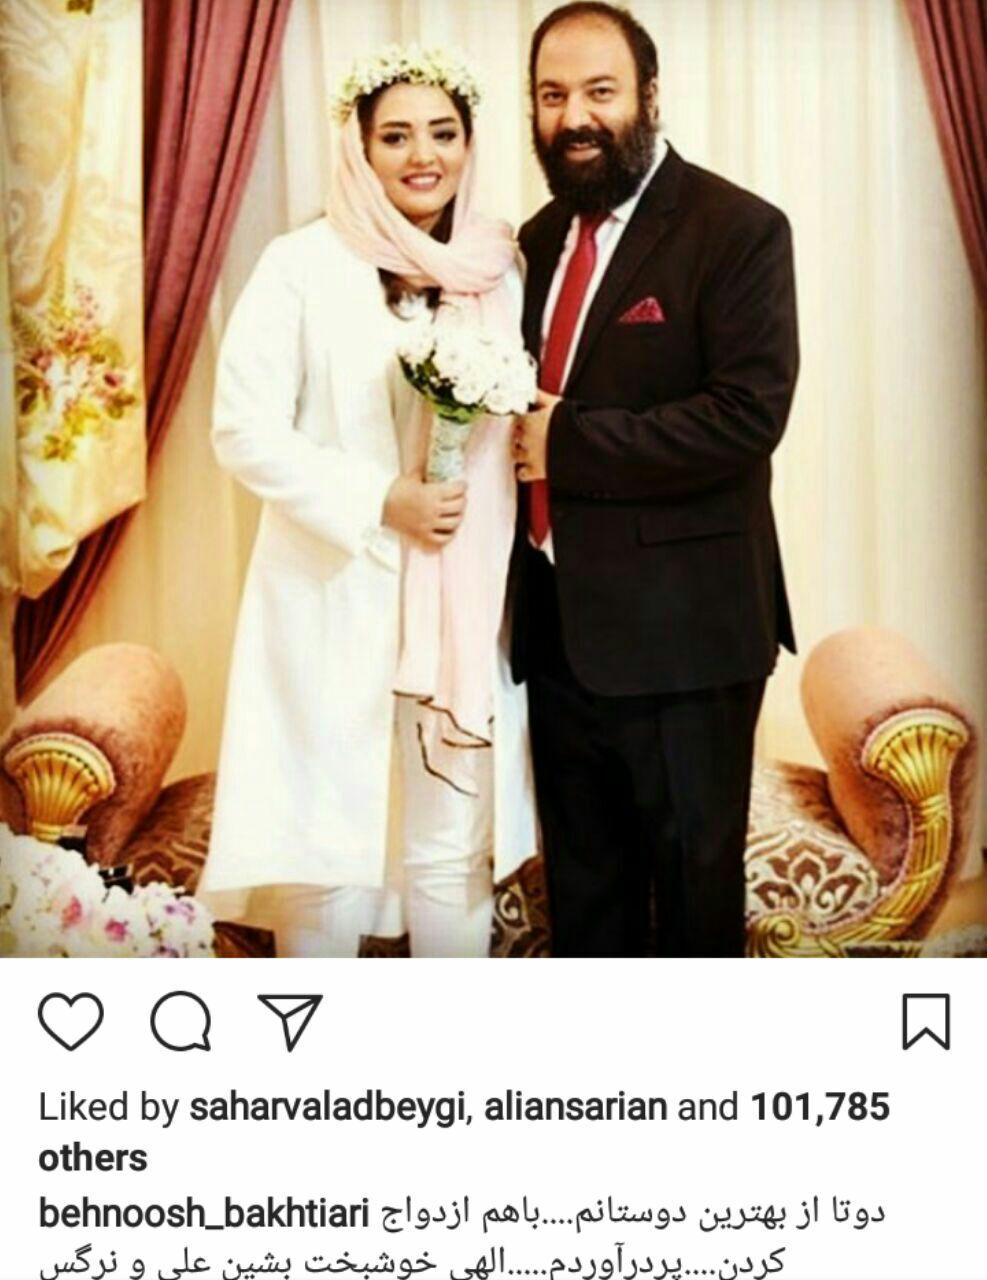 دو بازیگر سینما و تلویزیون ازدواج کردند+ عکس